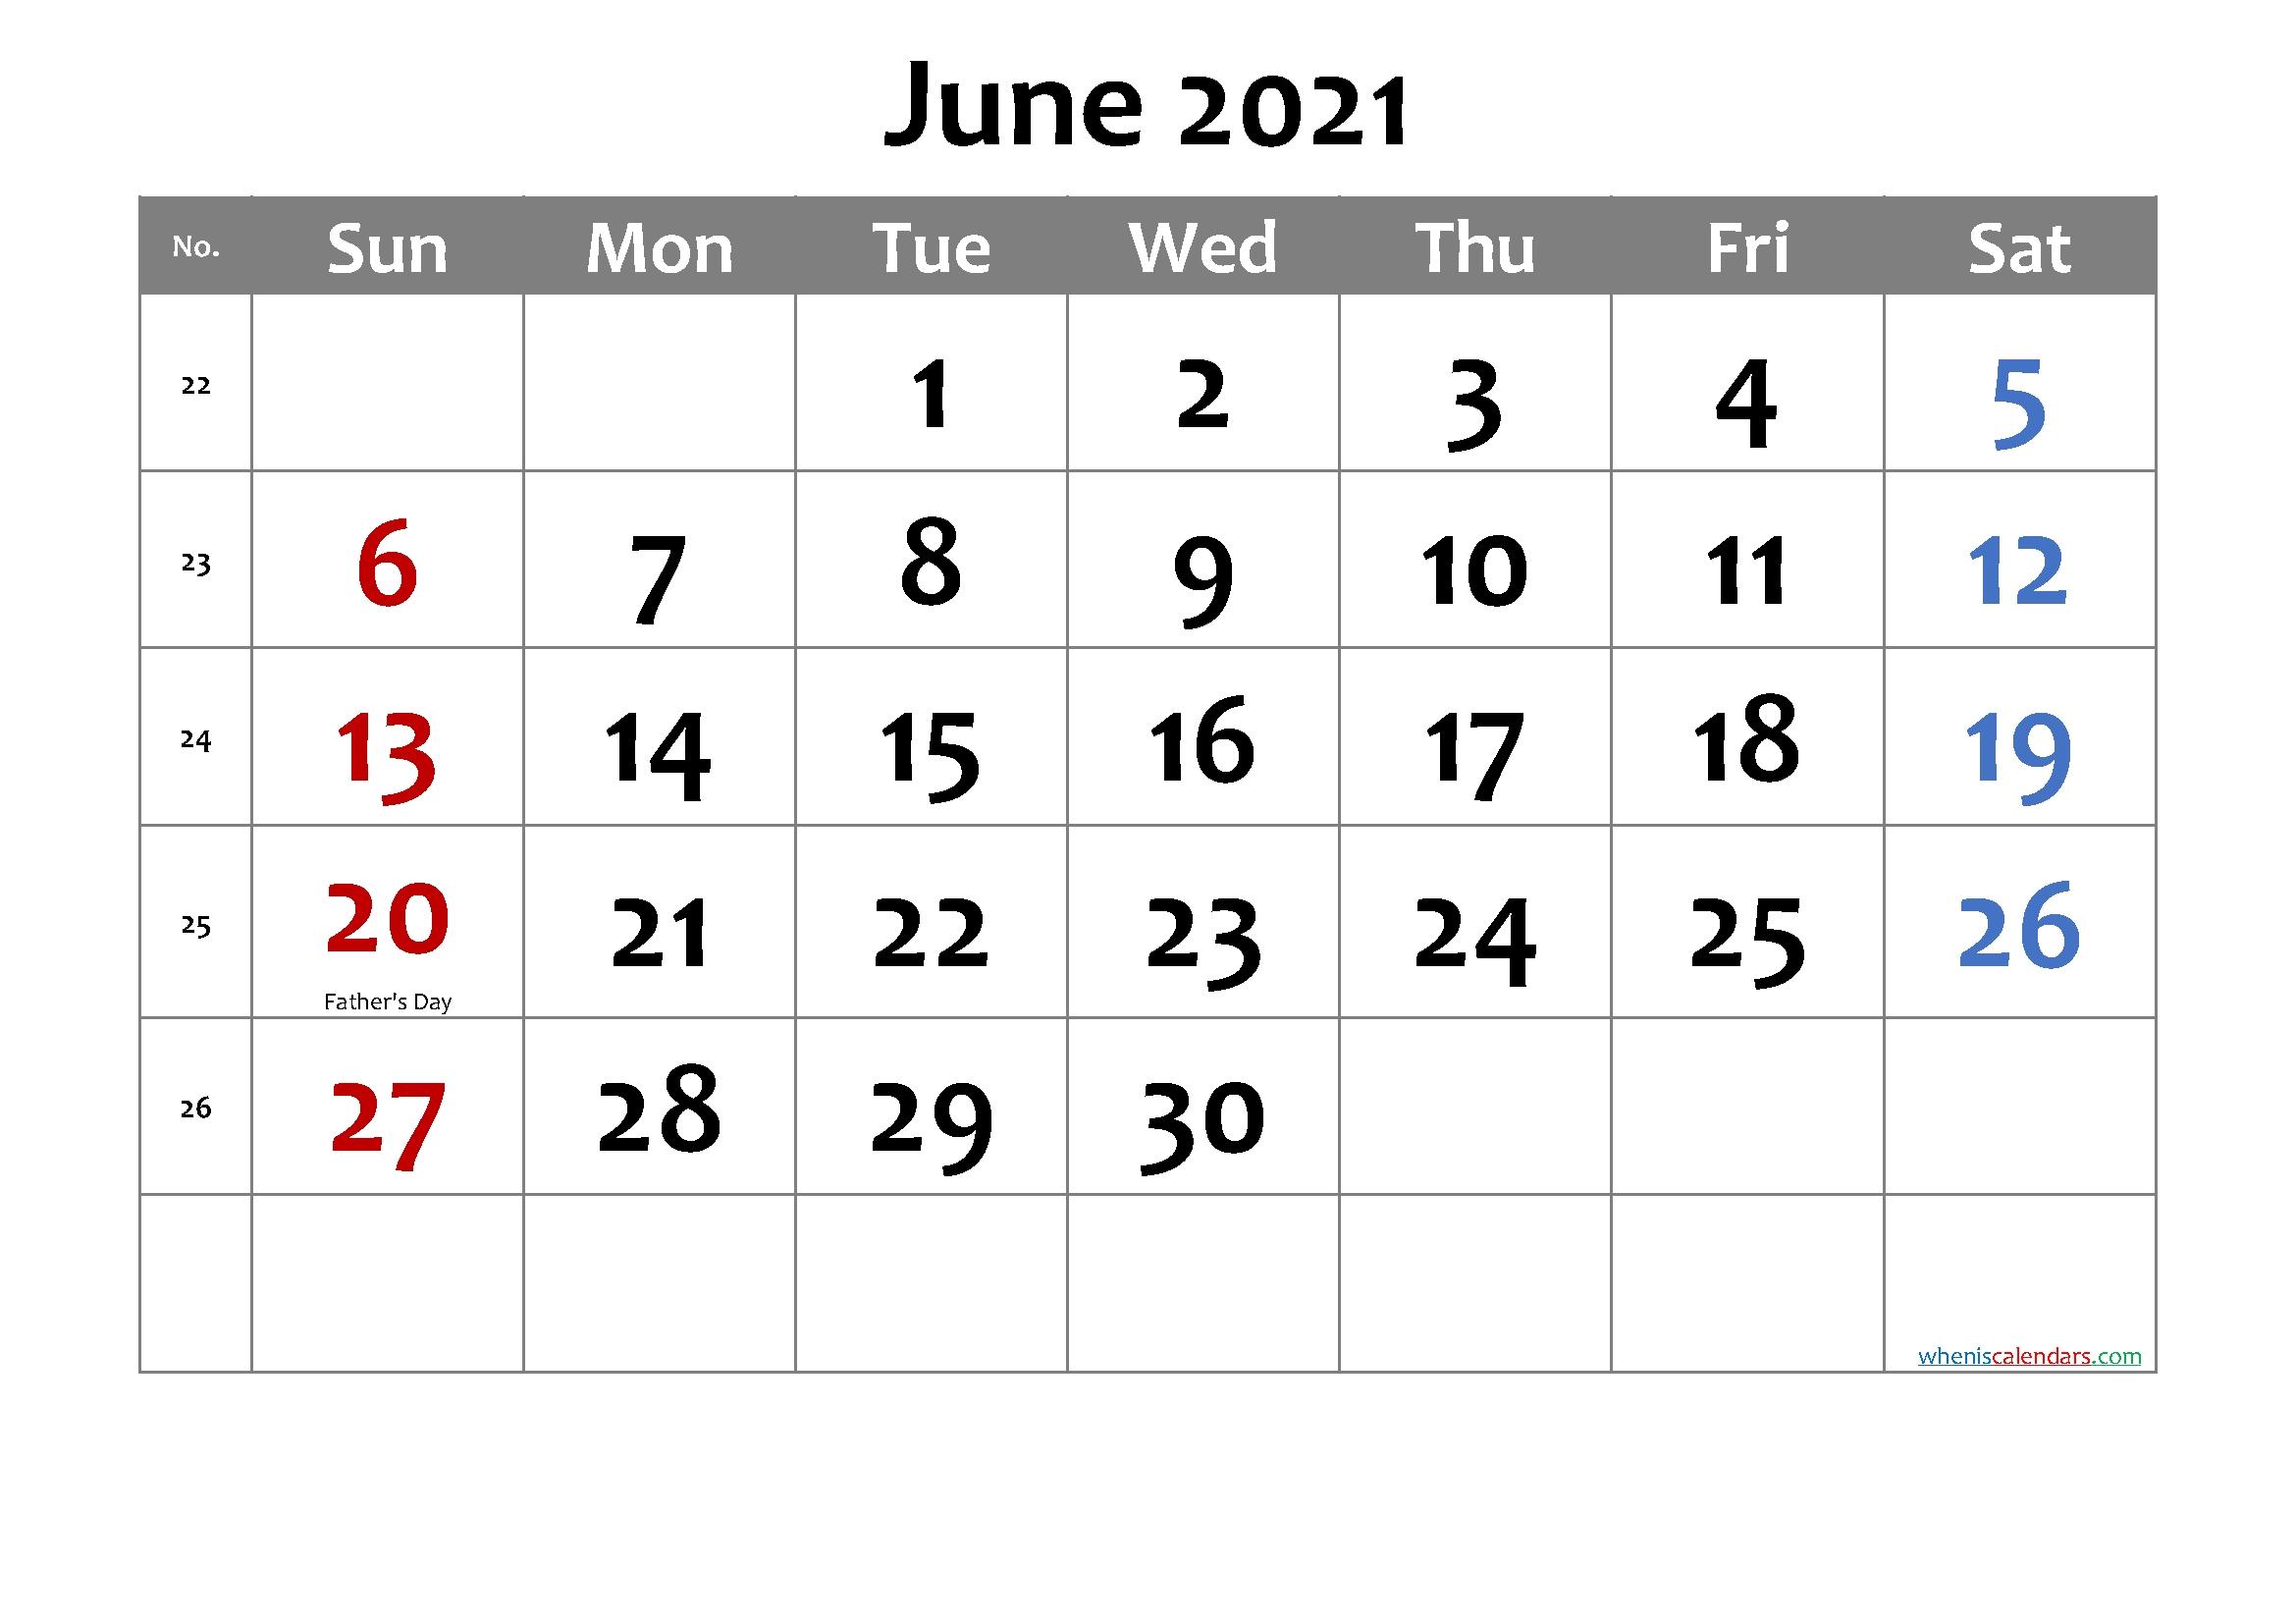 Free Printable June 2021 Calendar With Holidays Printable Calendar June July August 2021